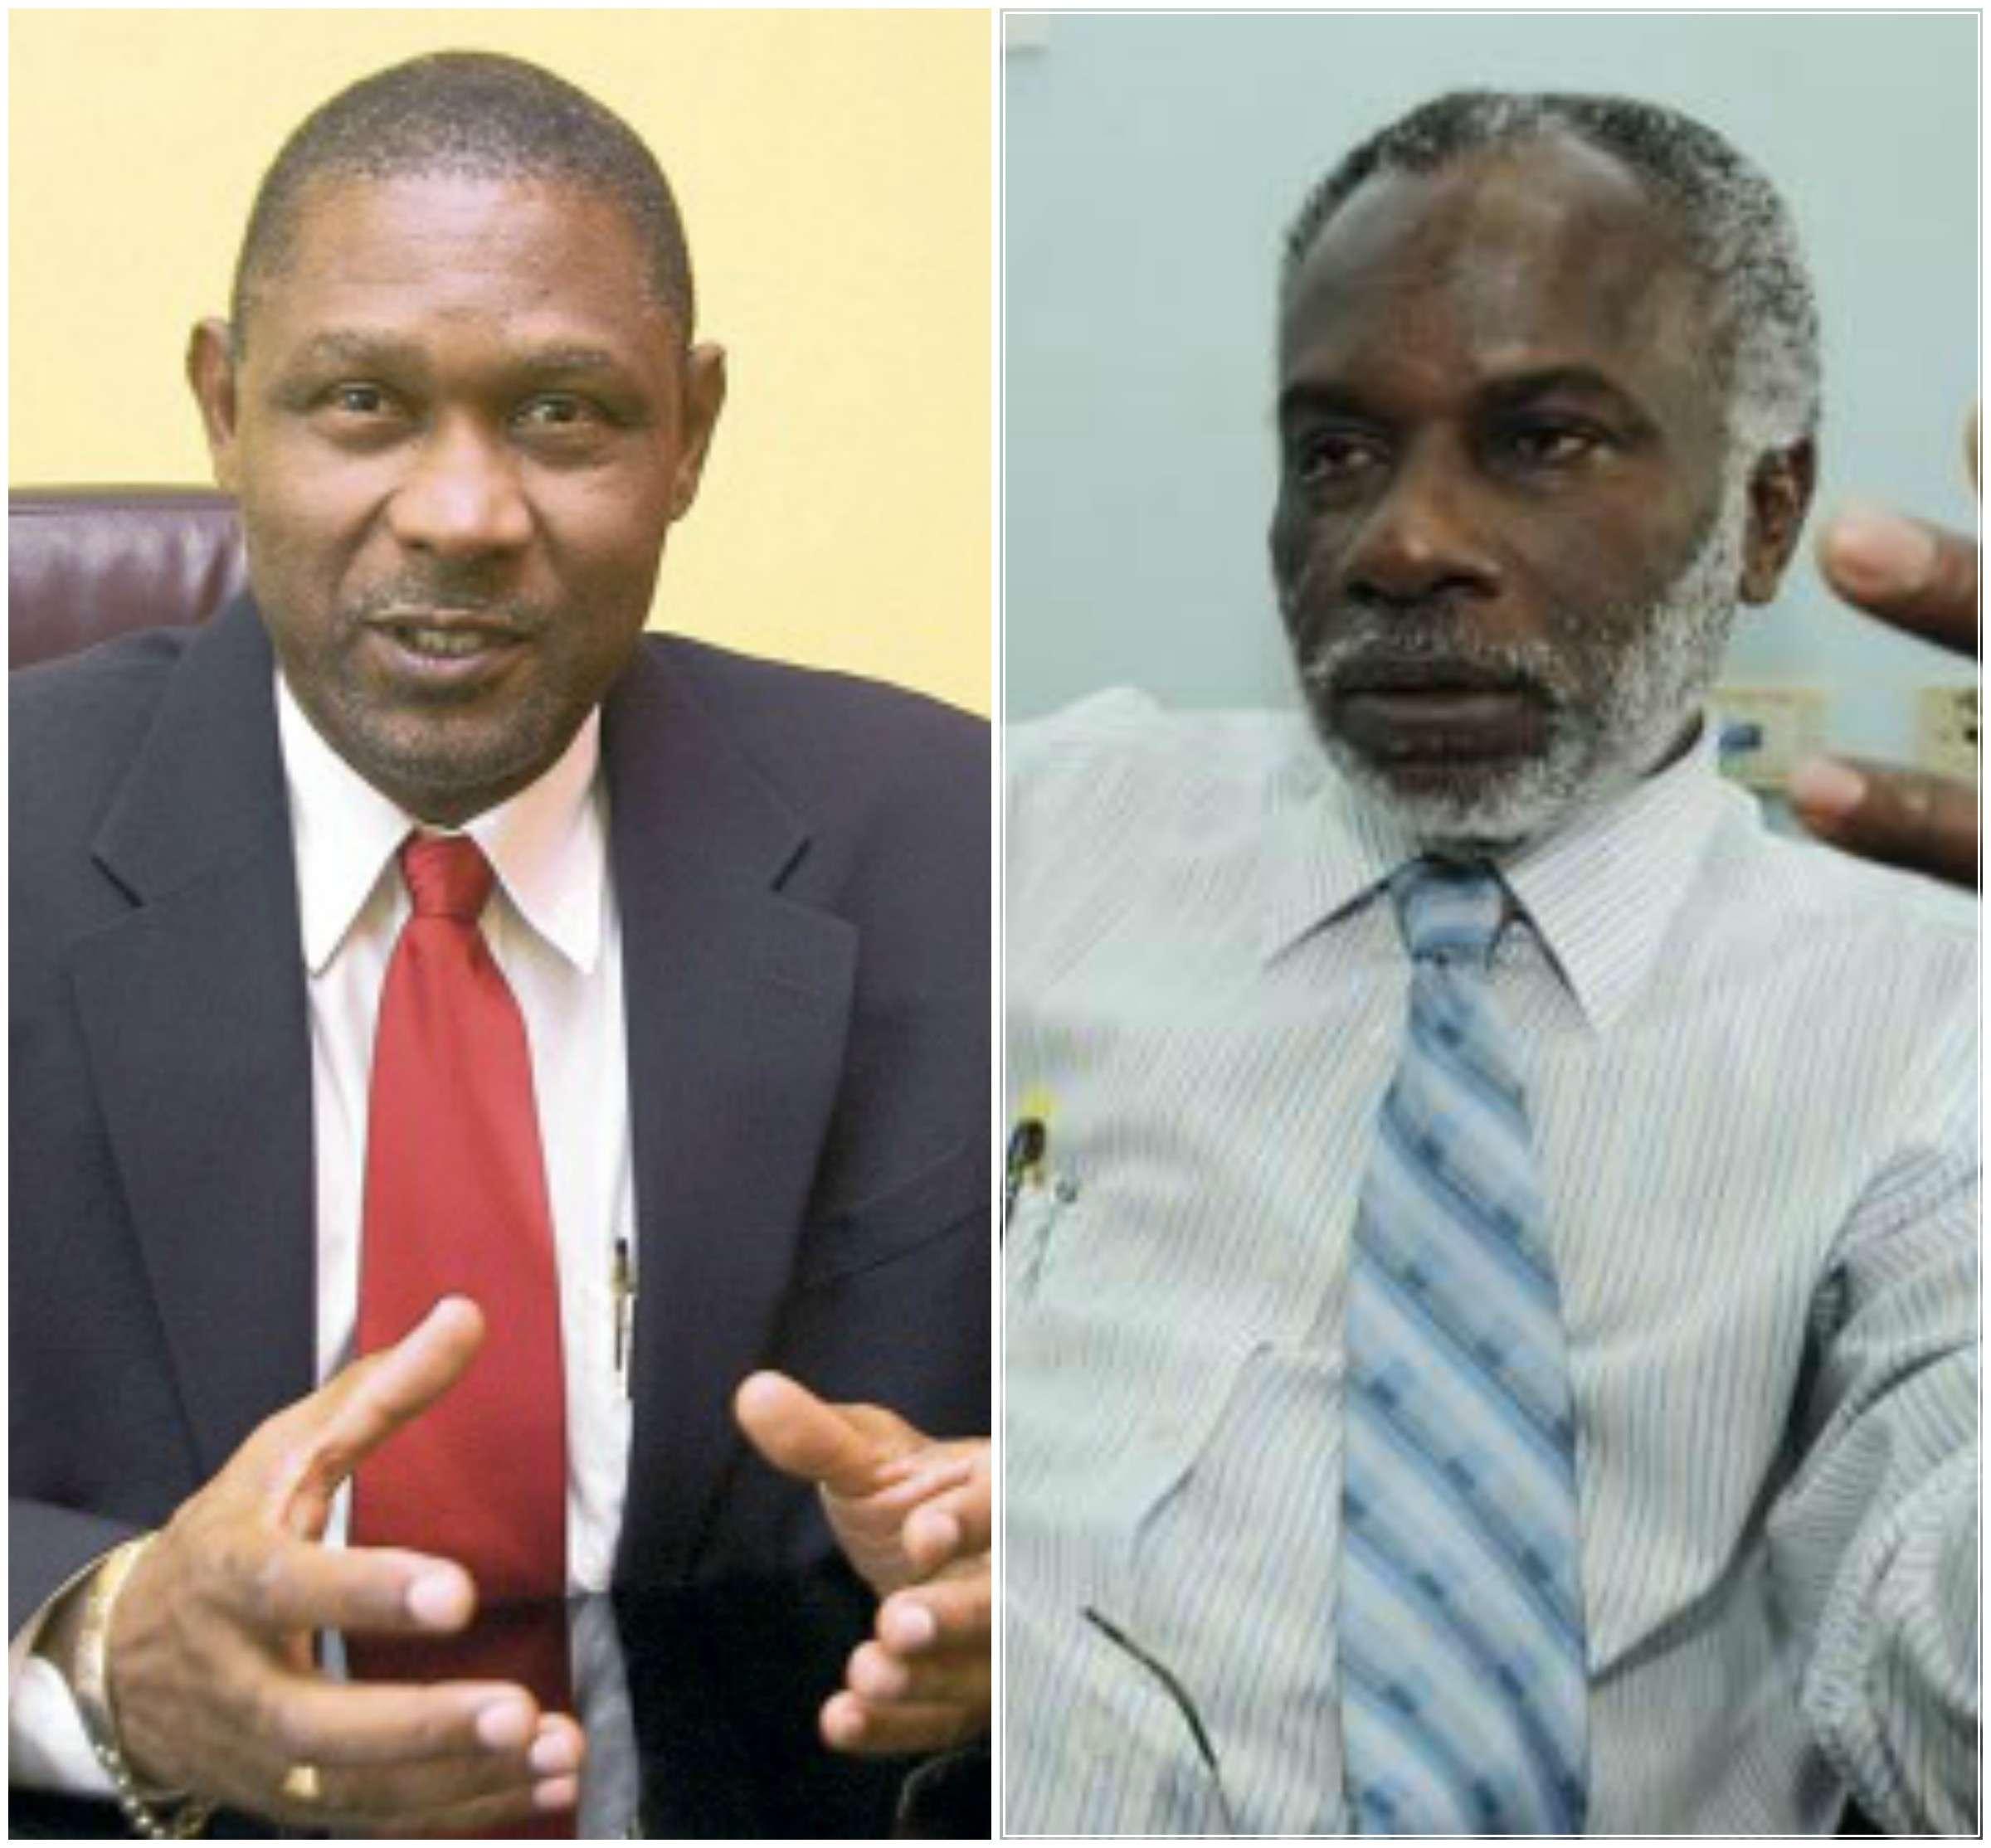 Jackson vs Hyman on JLP Tax Plan